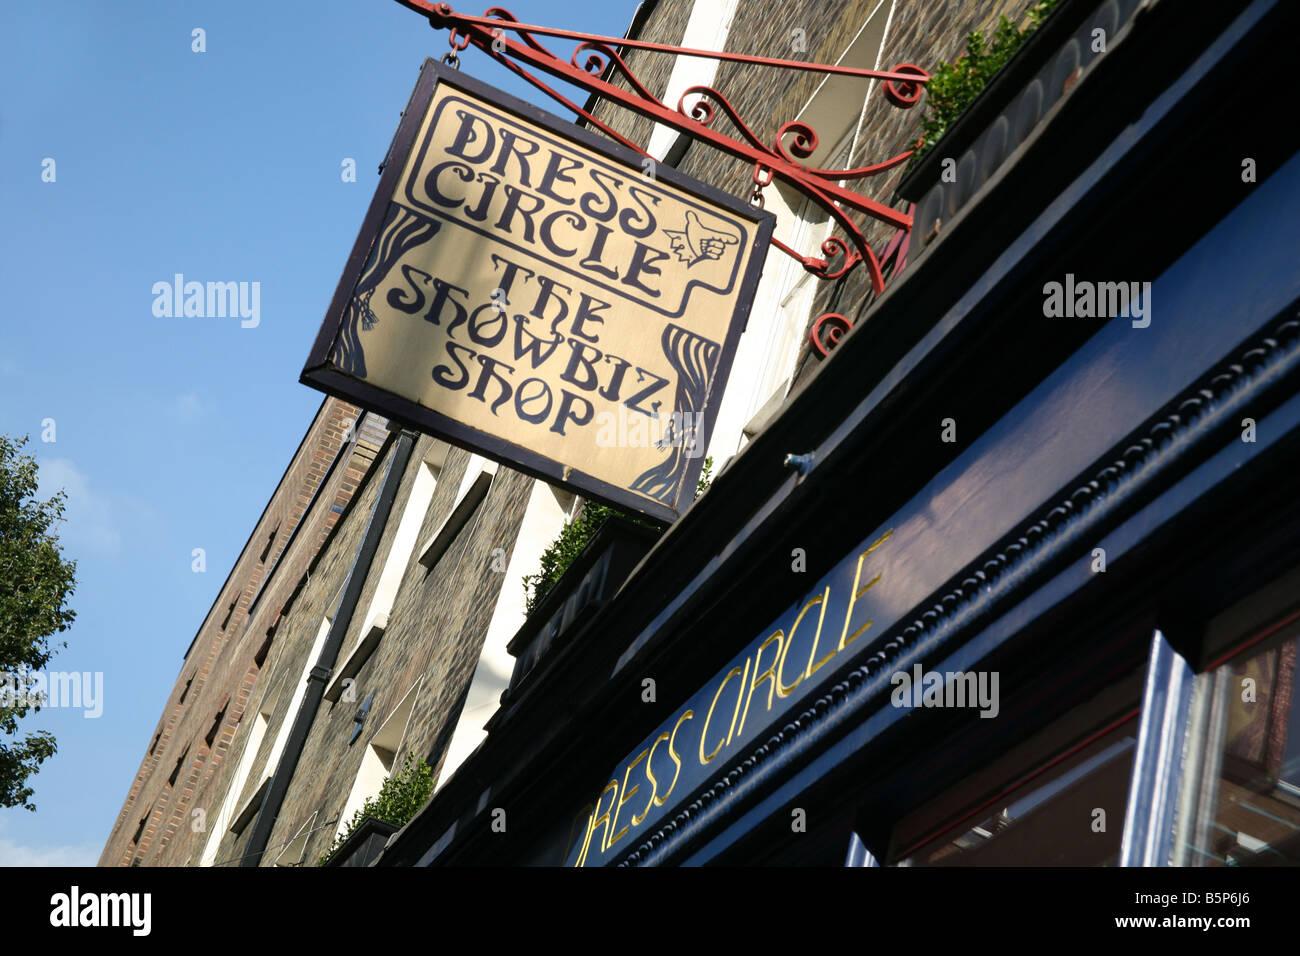 Dress Circle showbiz shop in London's Covent Garden - Stock Image